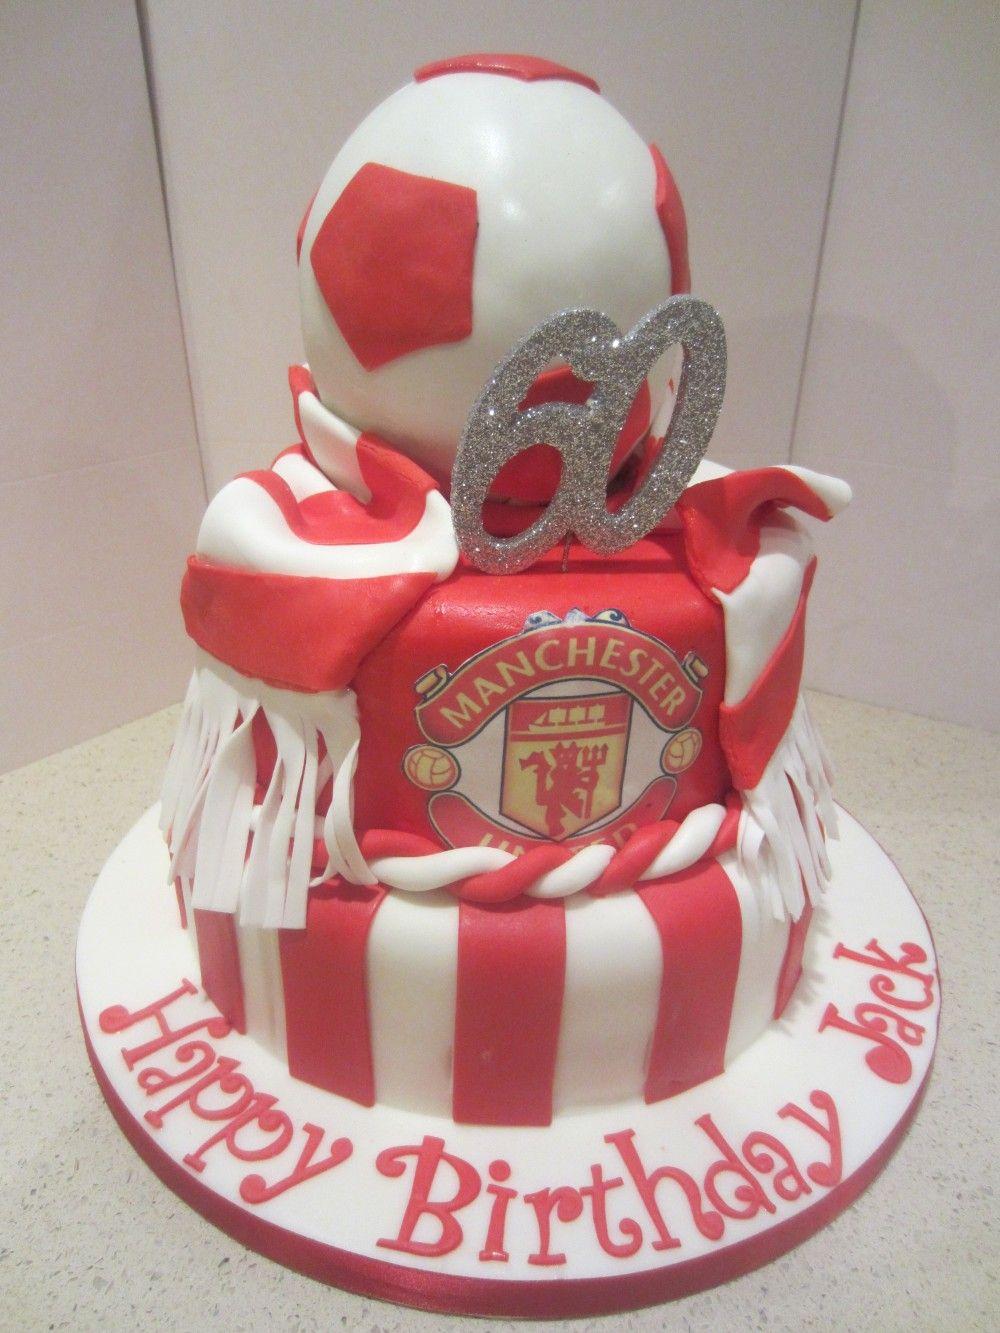 Man United Themed Cake Birthday cake, Cake, Soccer cake